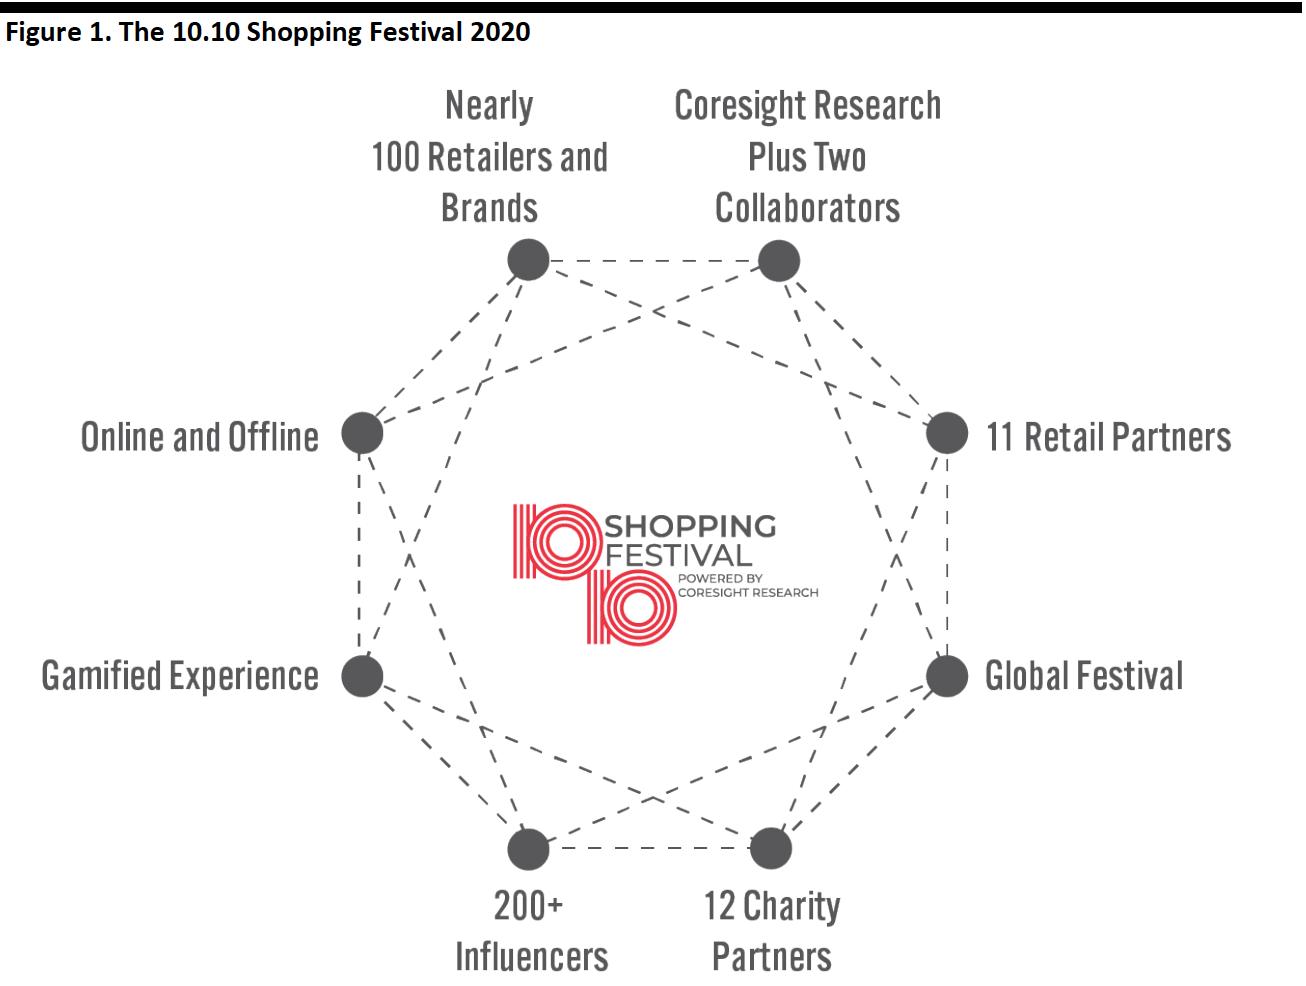 Figure 1. The 10.10 Shopping Festival 2020